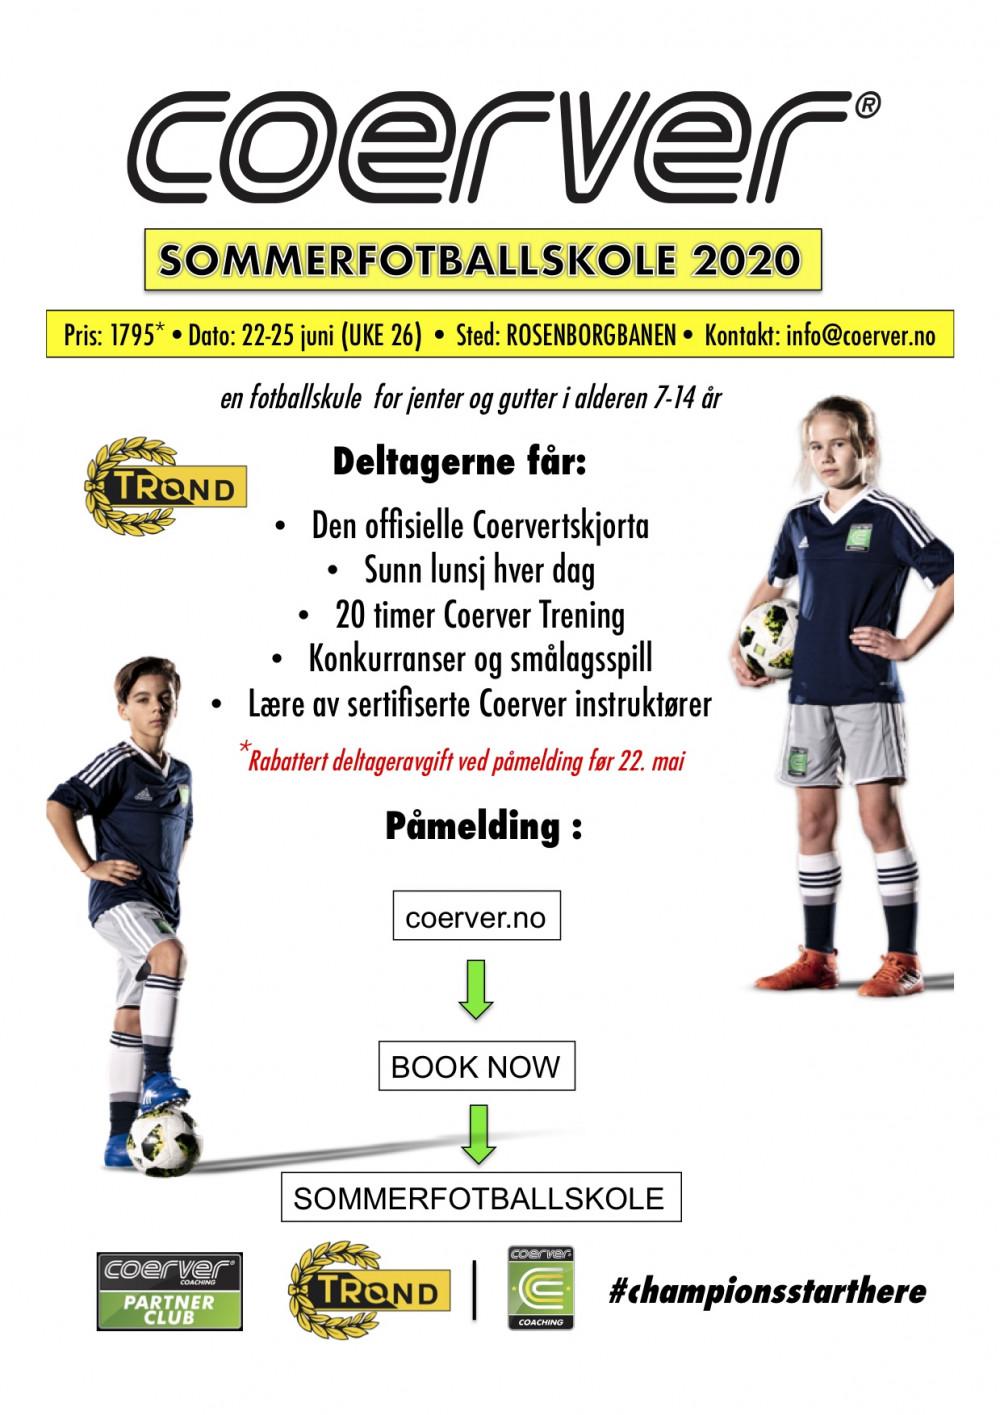 Coerver Sommerfotballskole hos IL Trond (UKE 26)  2006-2013